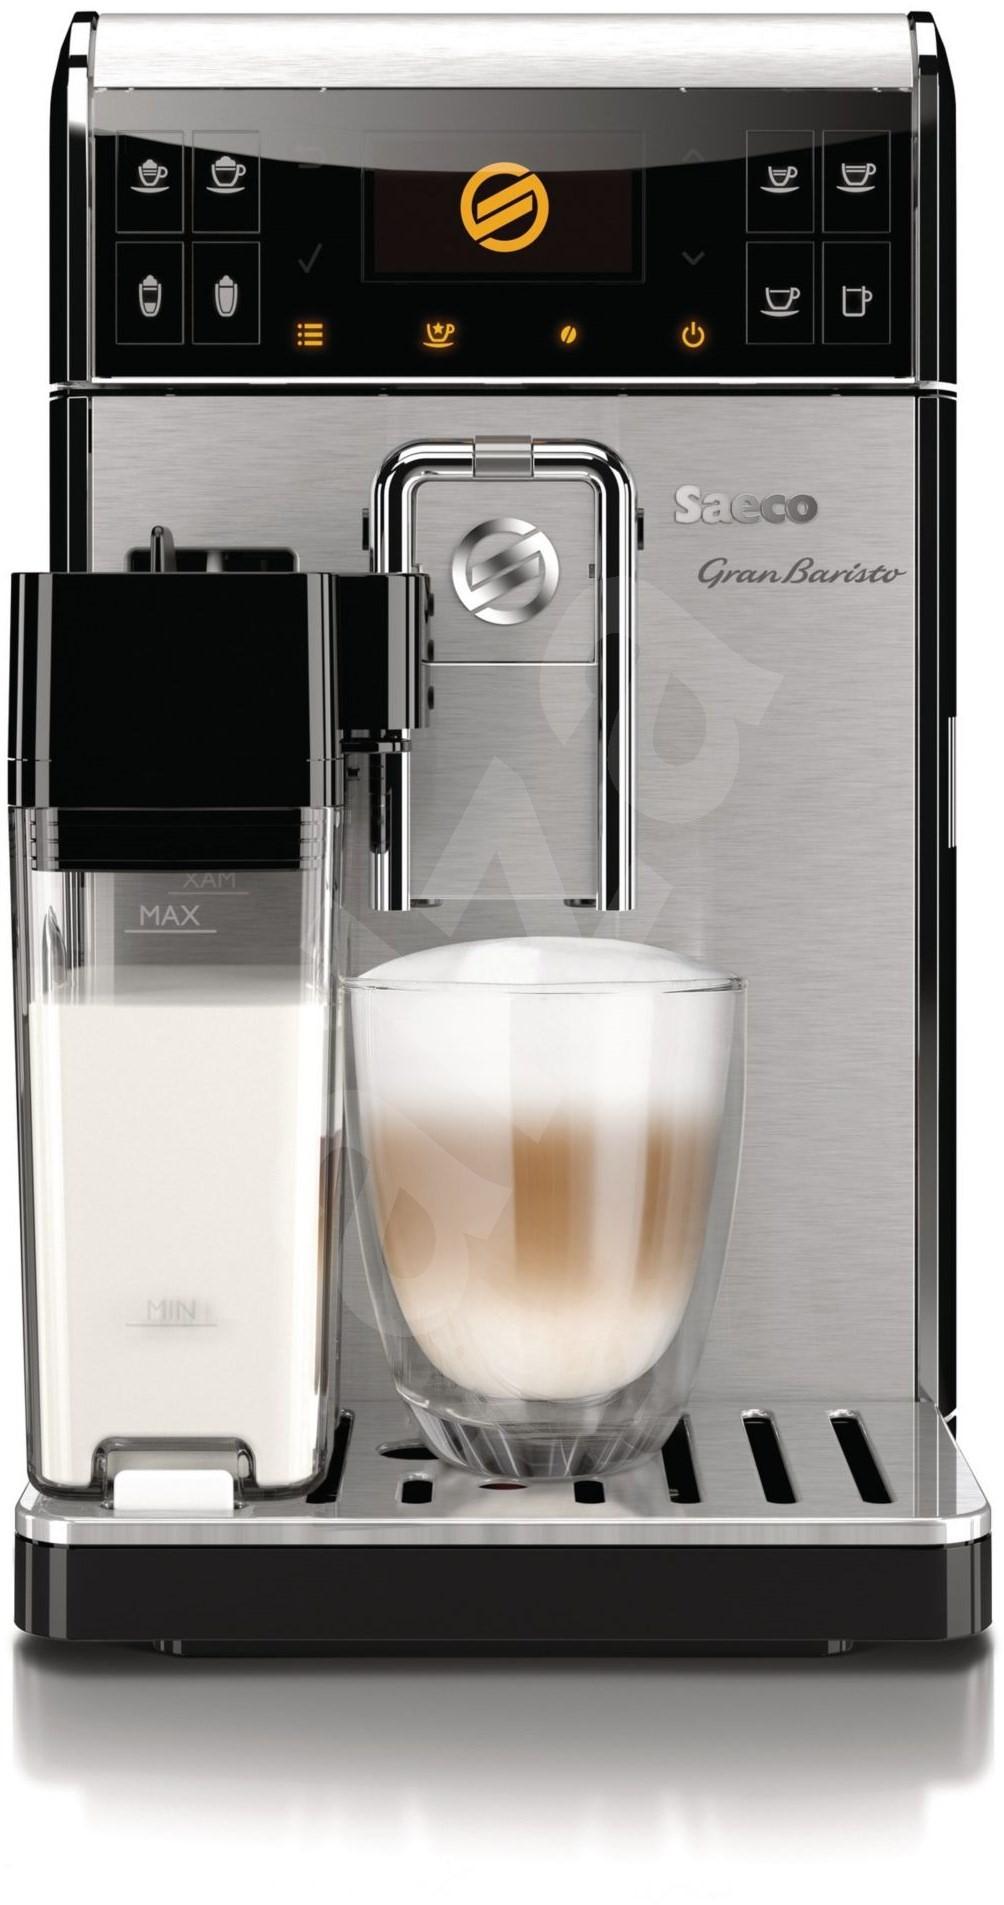 Philips Saeco Hd8965 01 Gran Baristo Alzashop Com